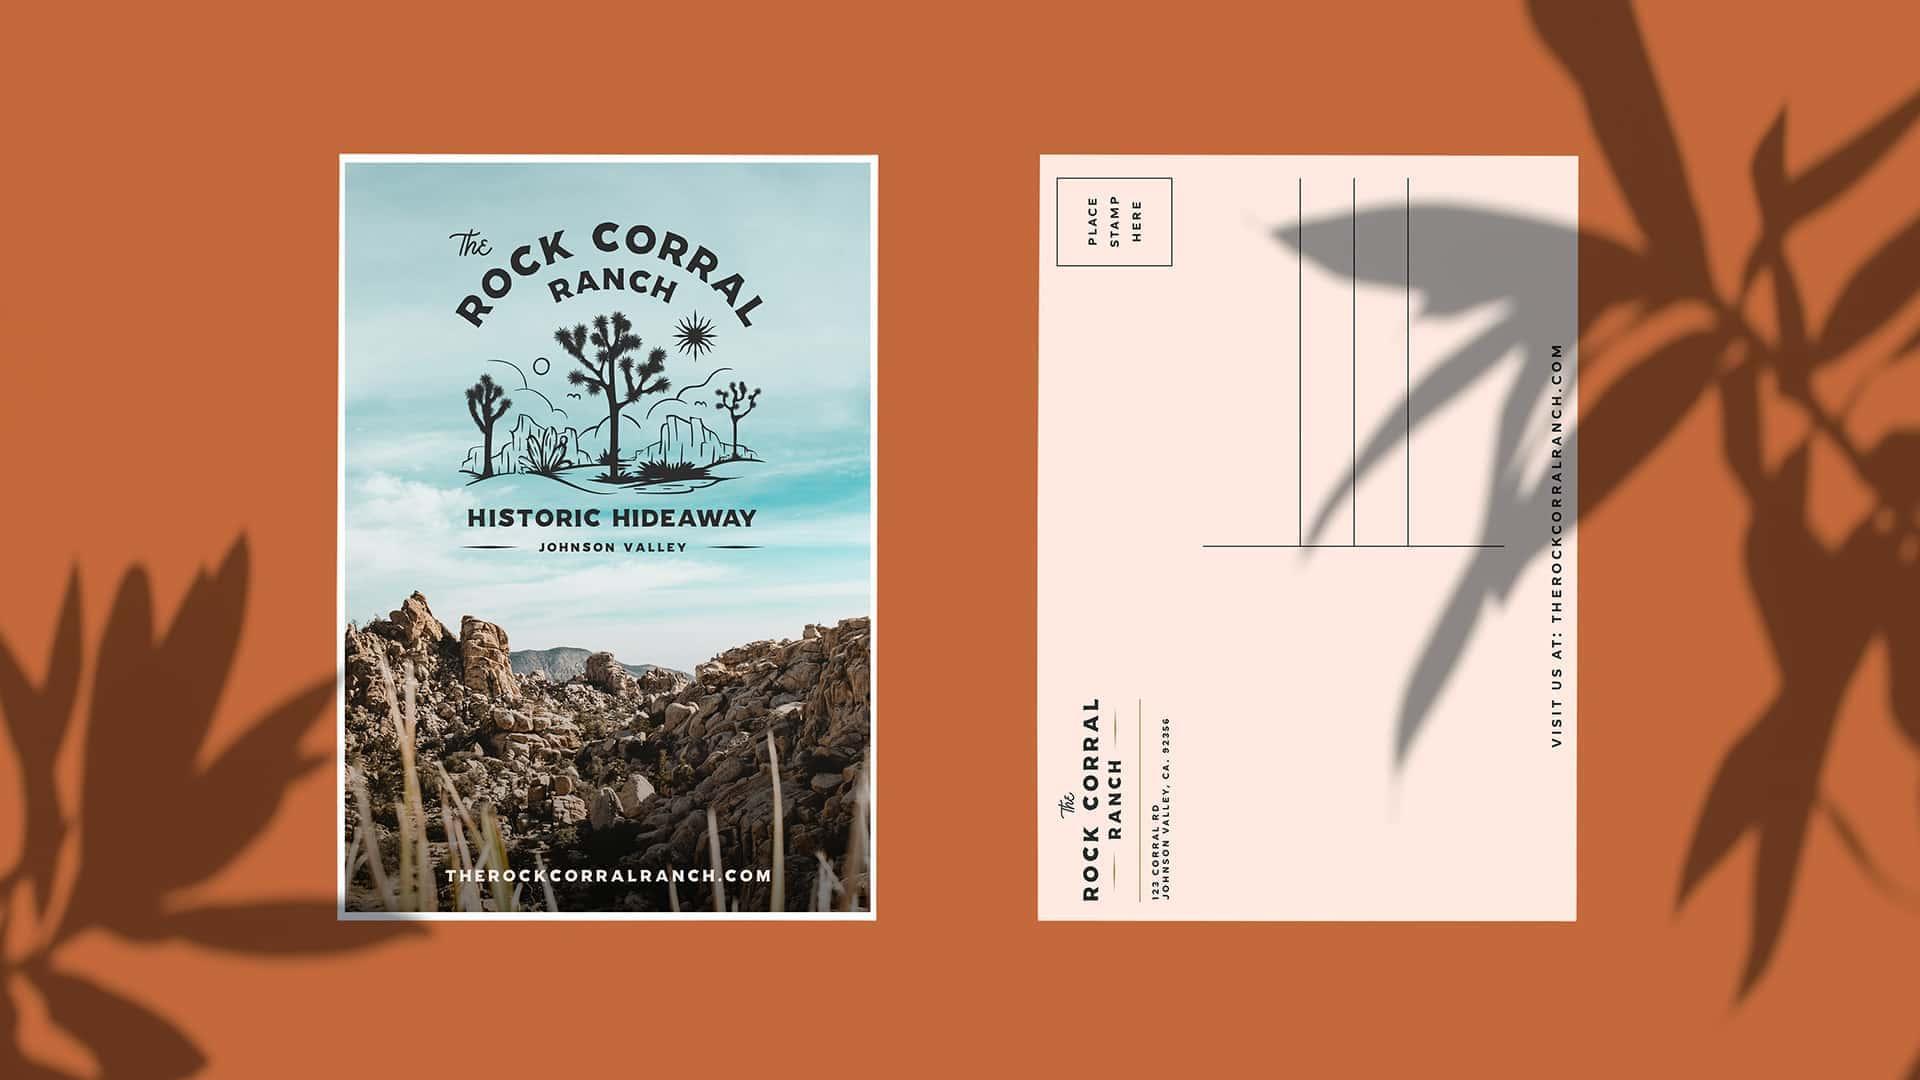 The Rock Corral Ranch Postcard - Unsung Studio Branding